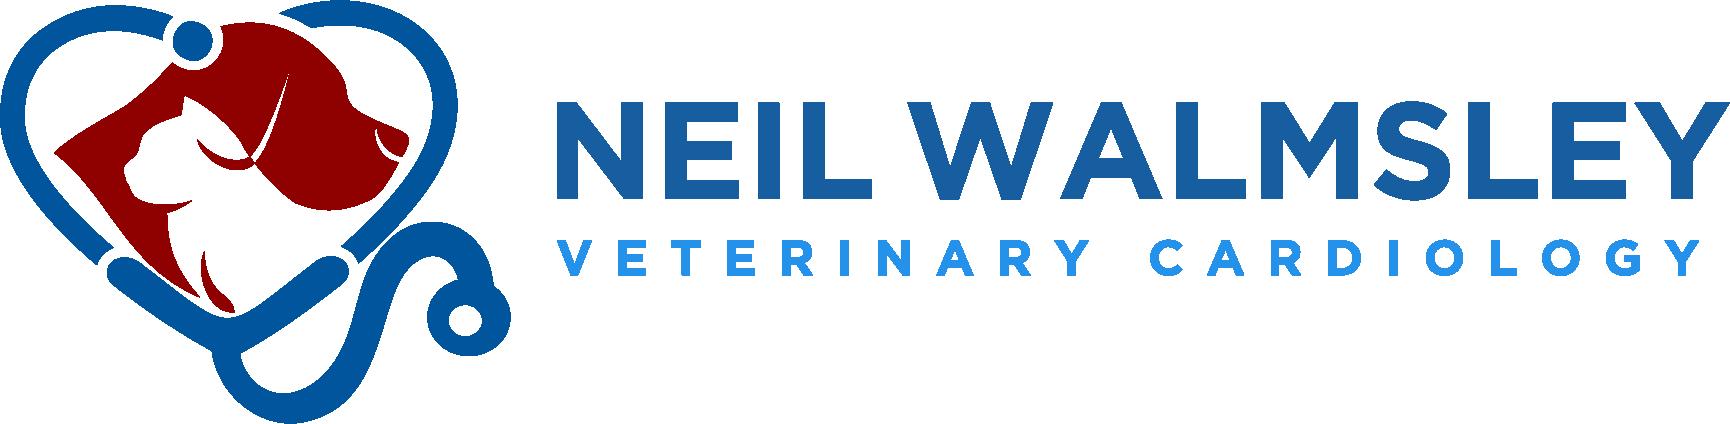 NEIL WALMSLEY logo.png